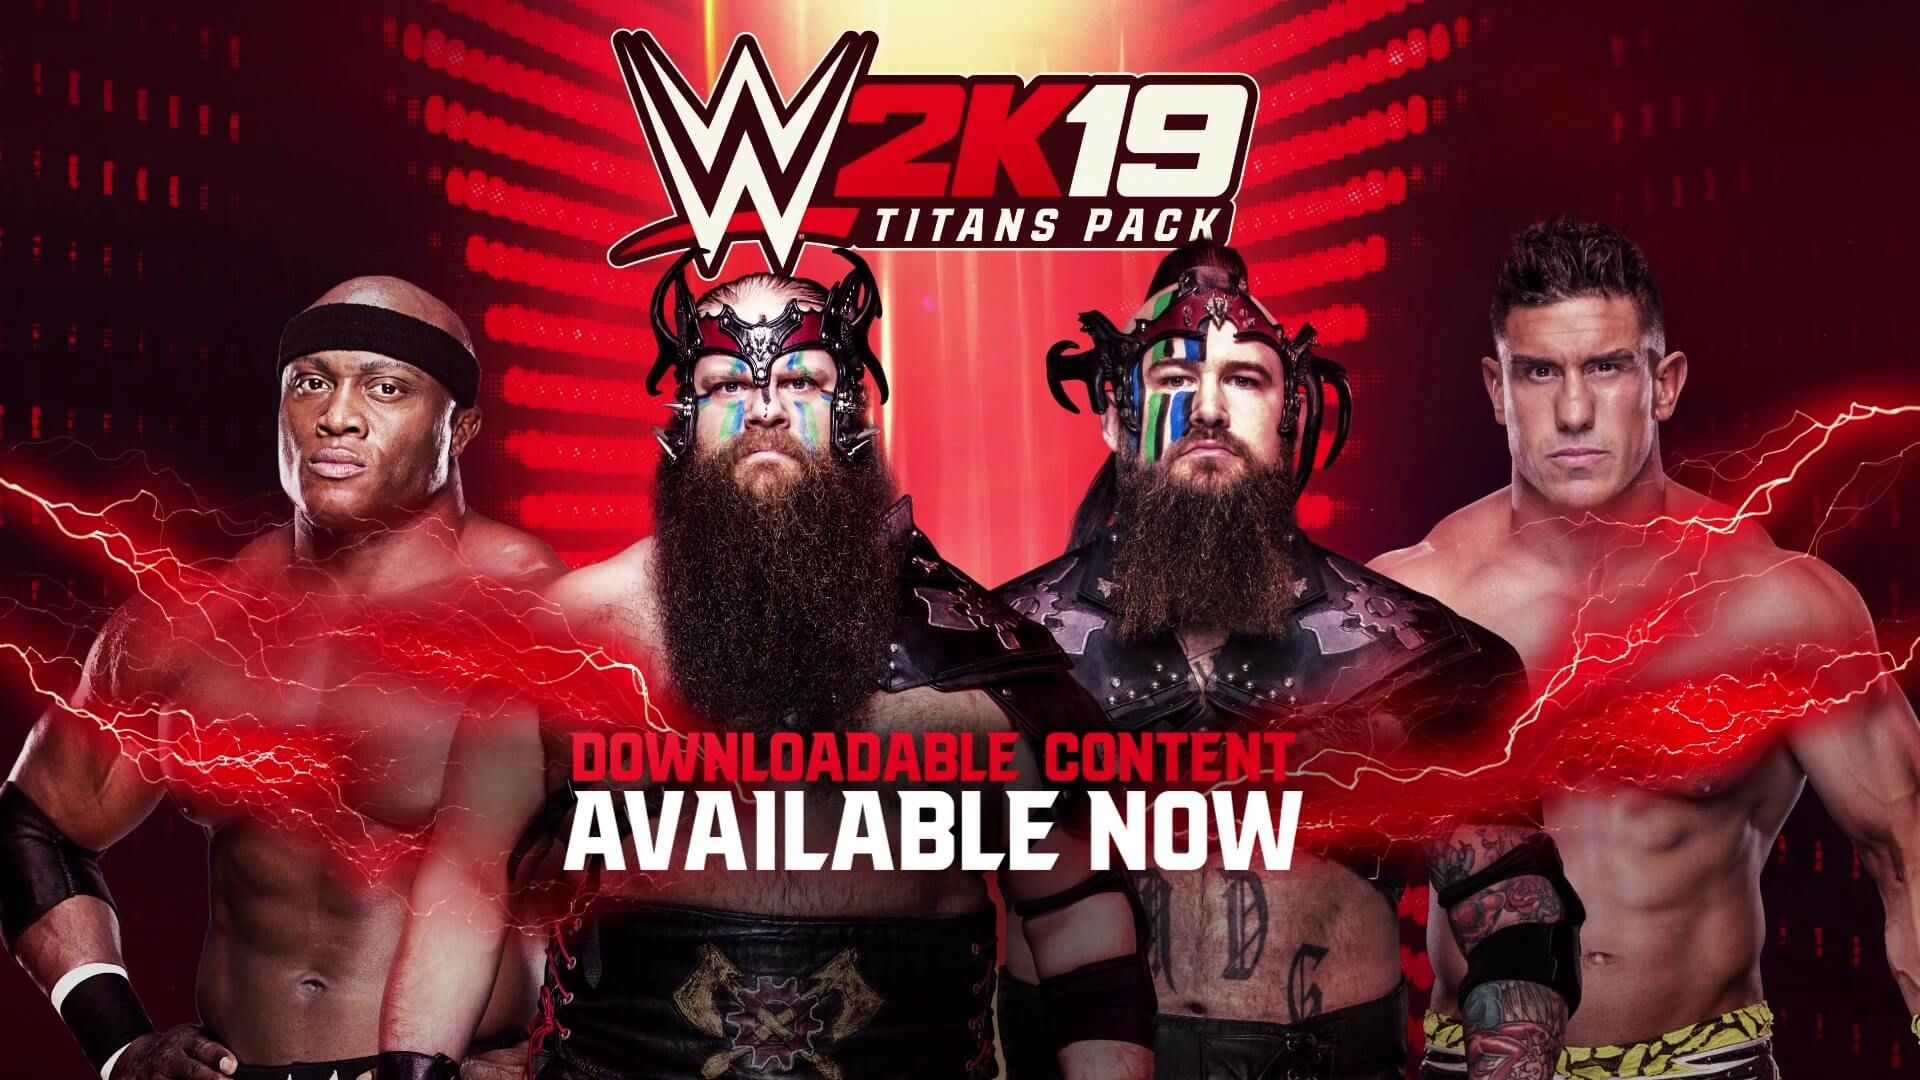 titans-pack-wwe-2k19